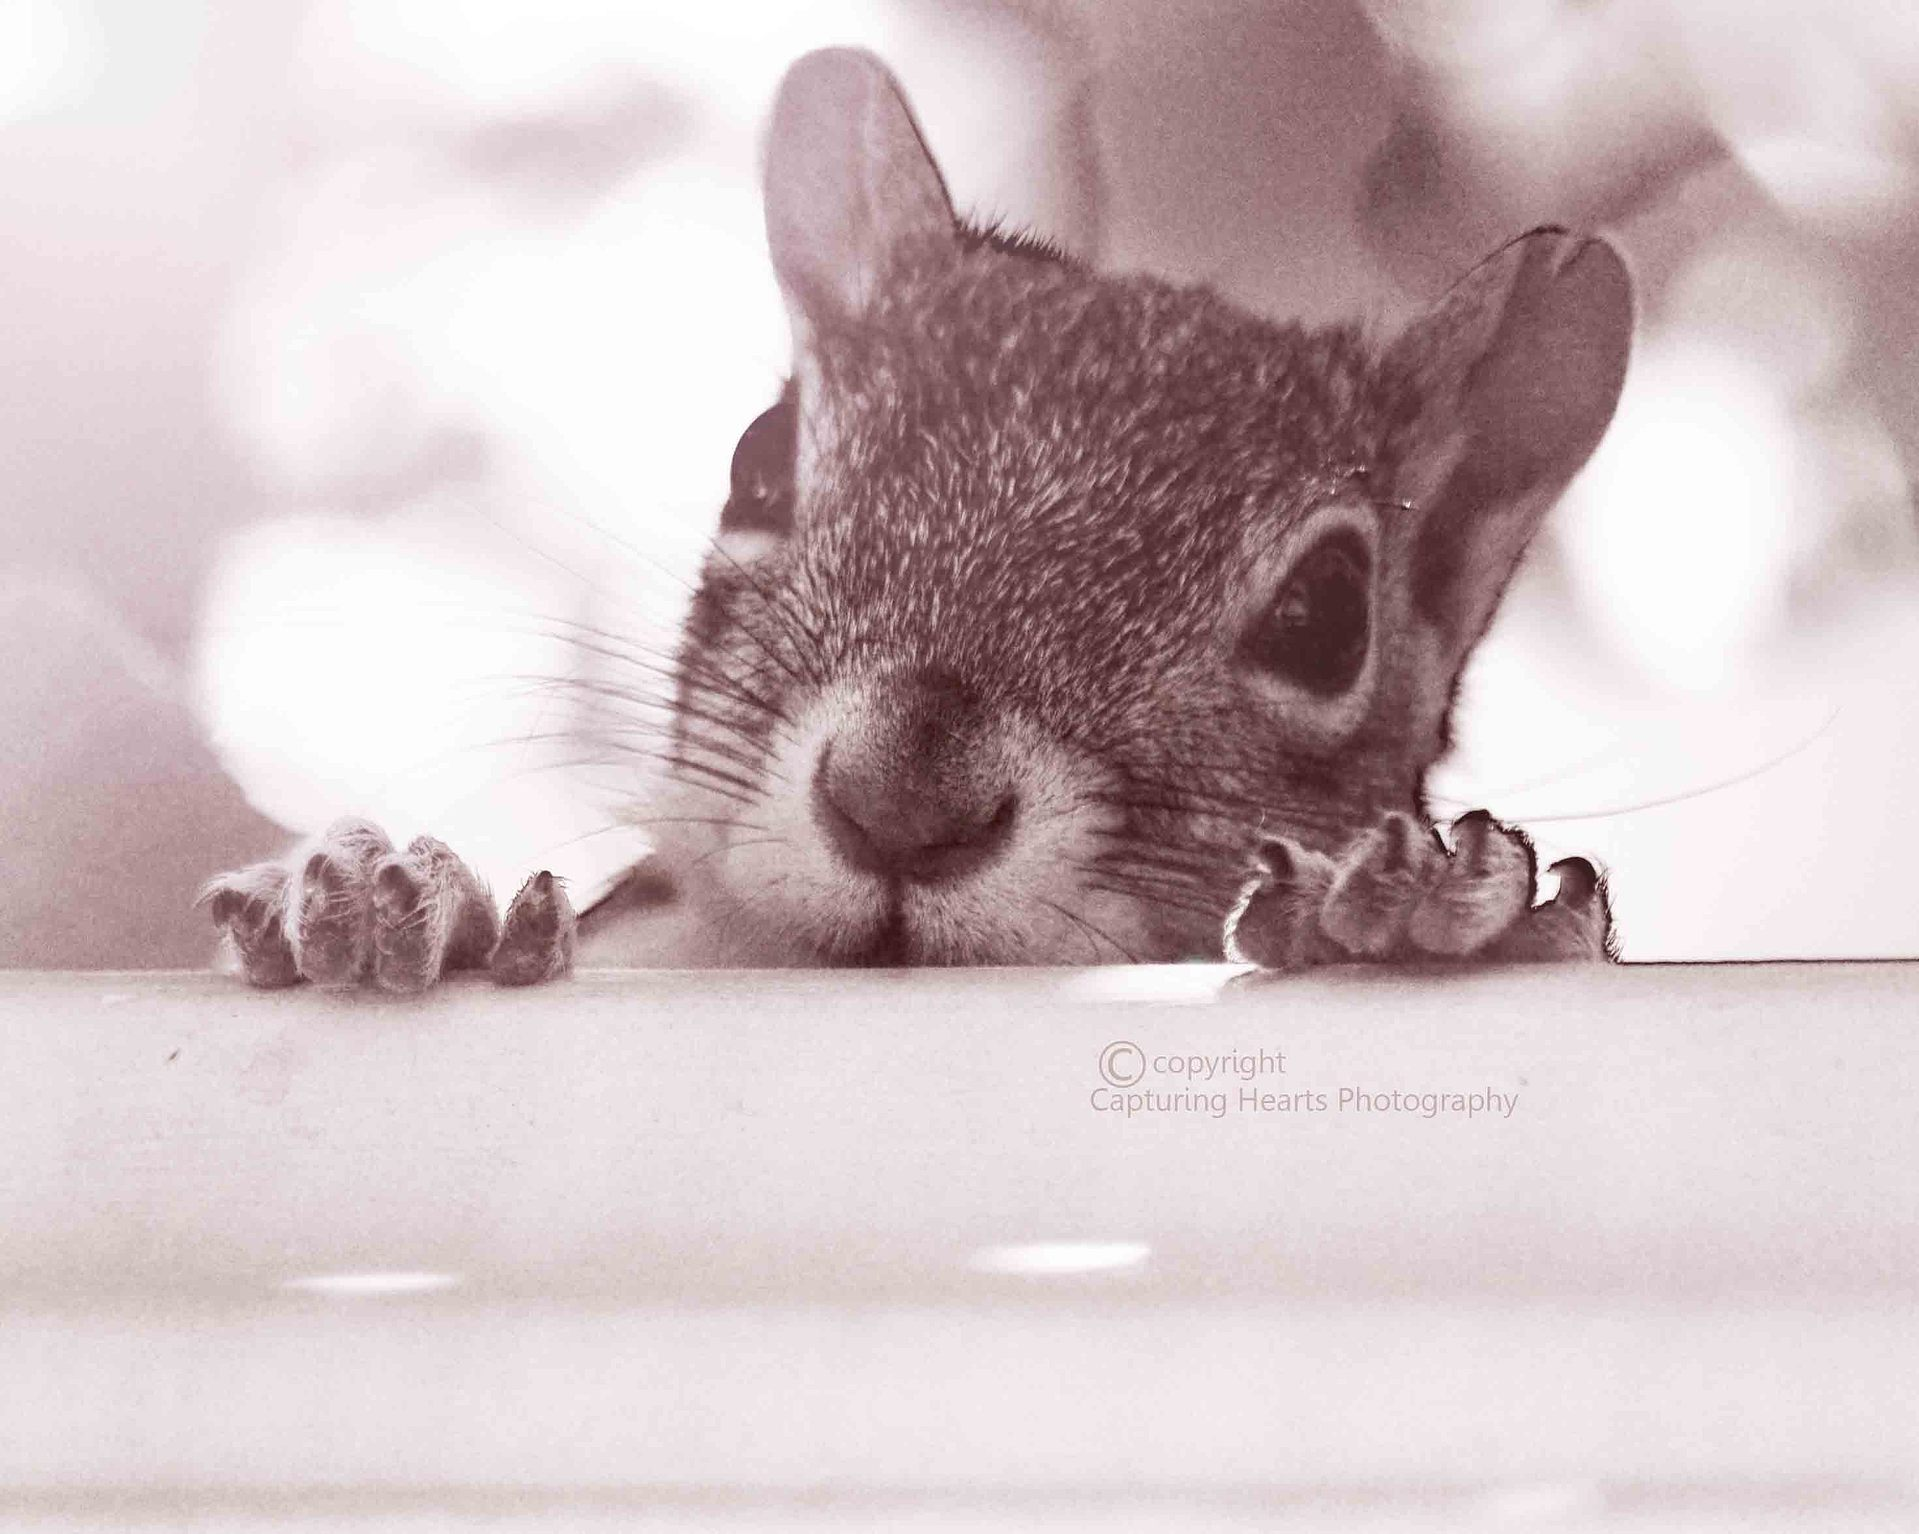 SquirrelPhotographyAnimalsNatureCOPYRIGHTSCREEN